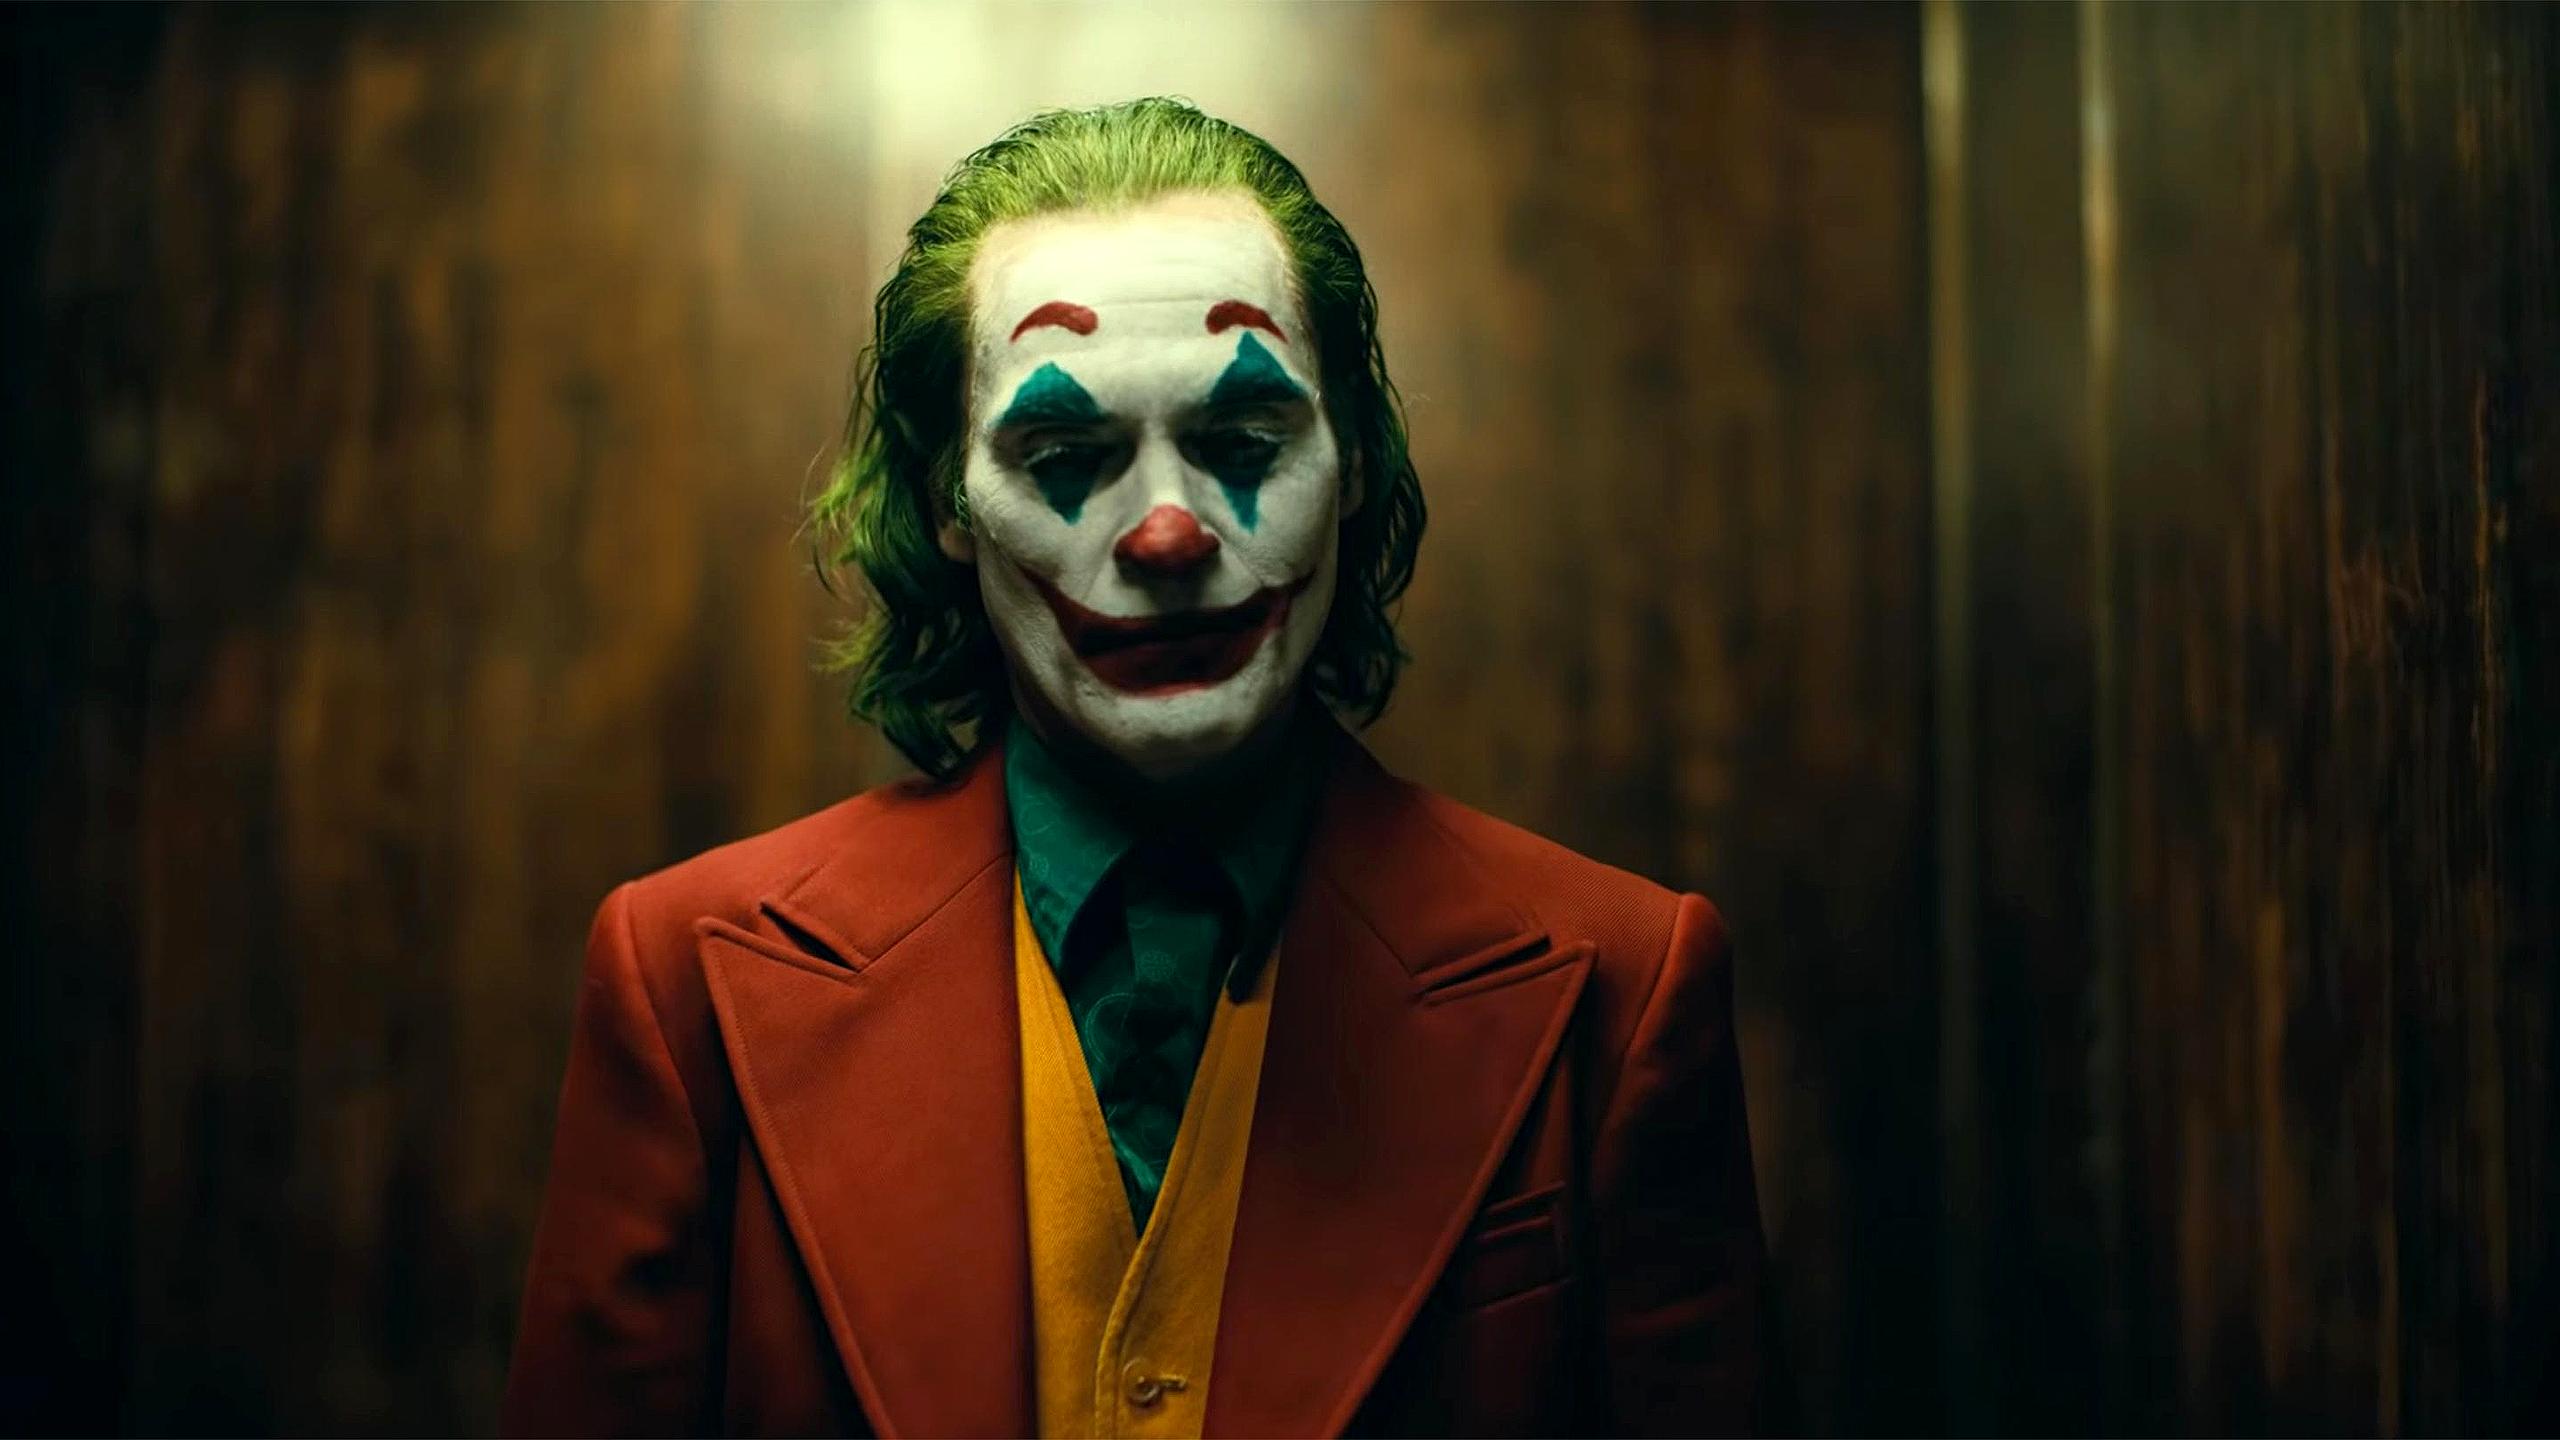 Joker 2019 [2560x1440] wallpapers 2560x1440